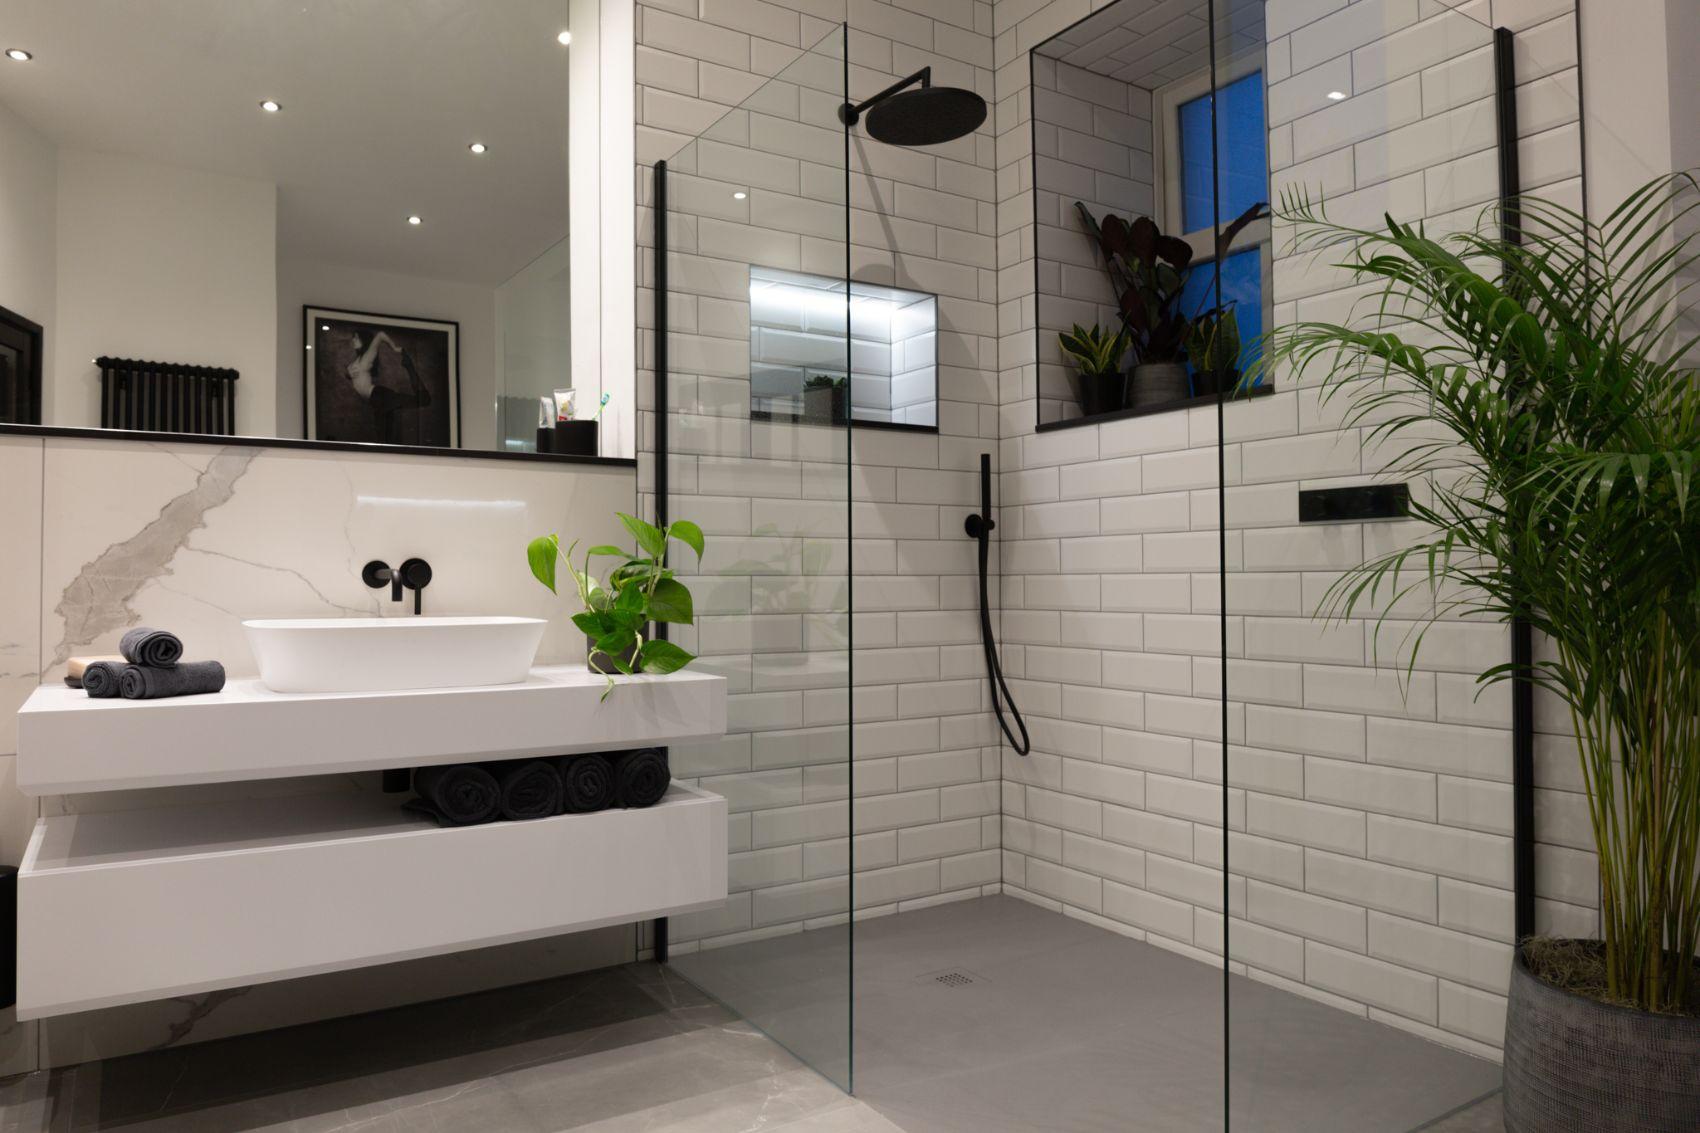 joes bathroom shower glass and sink